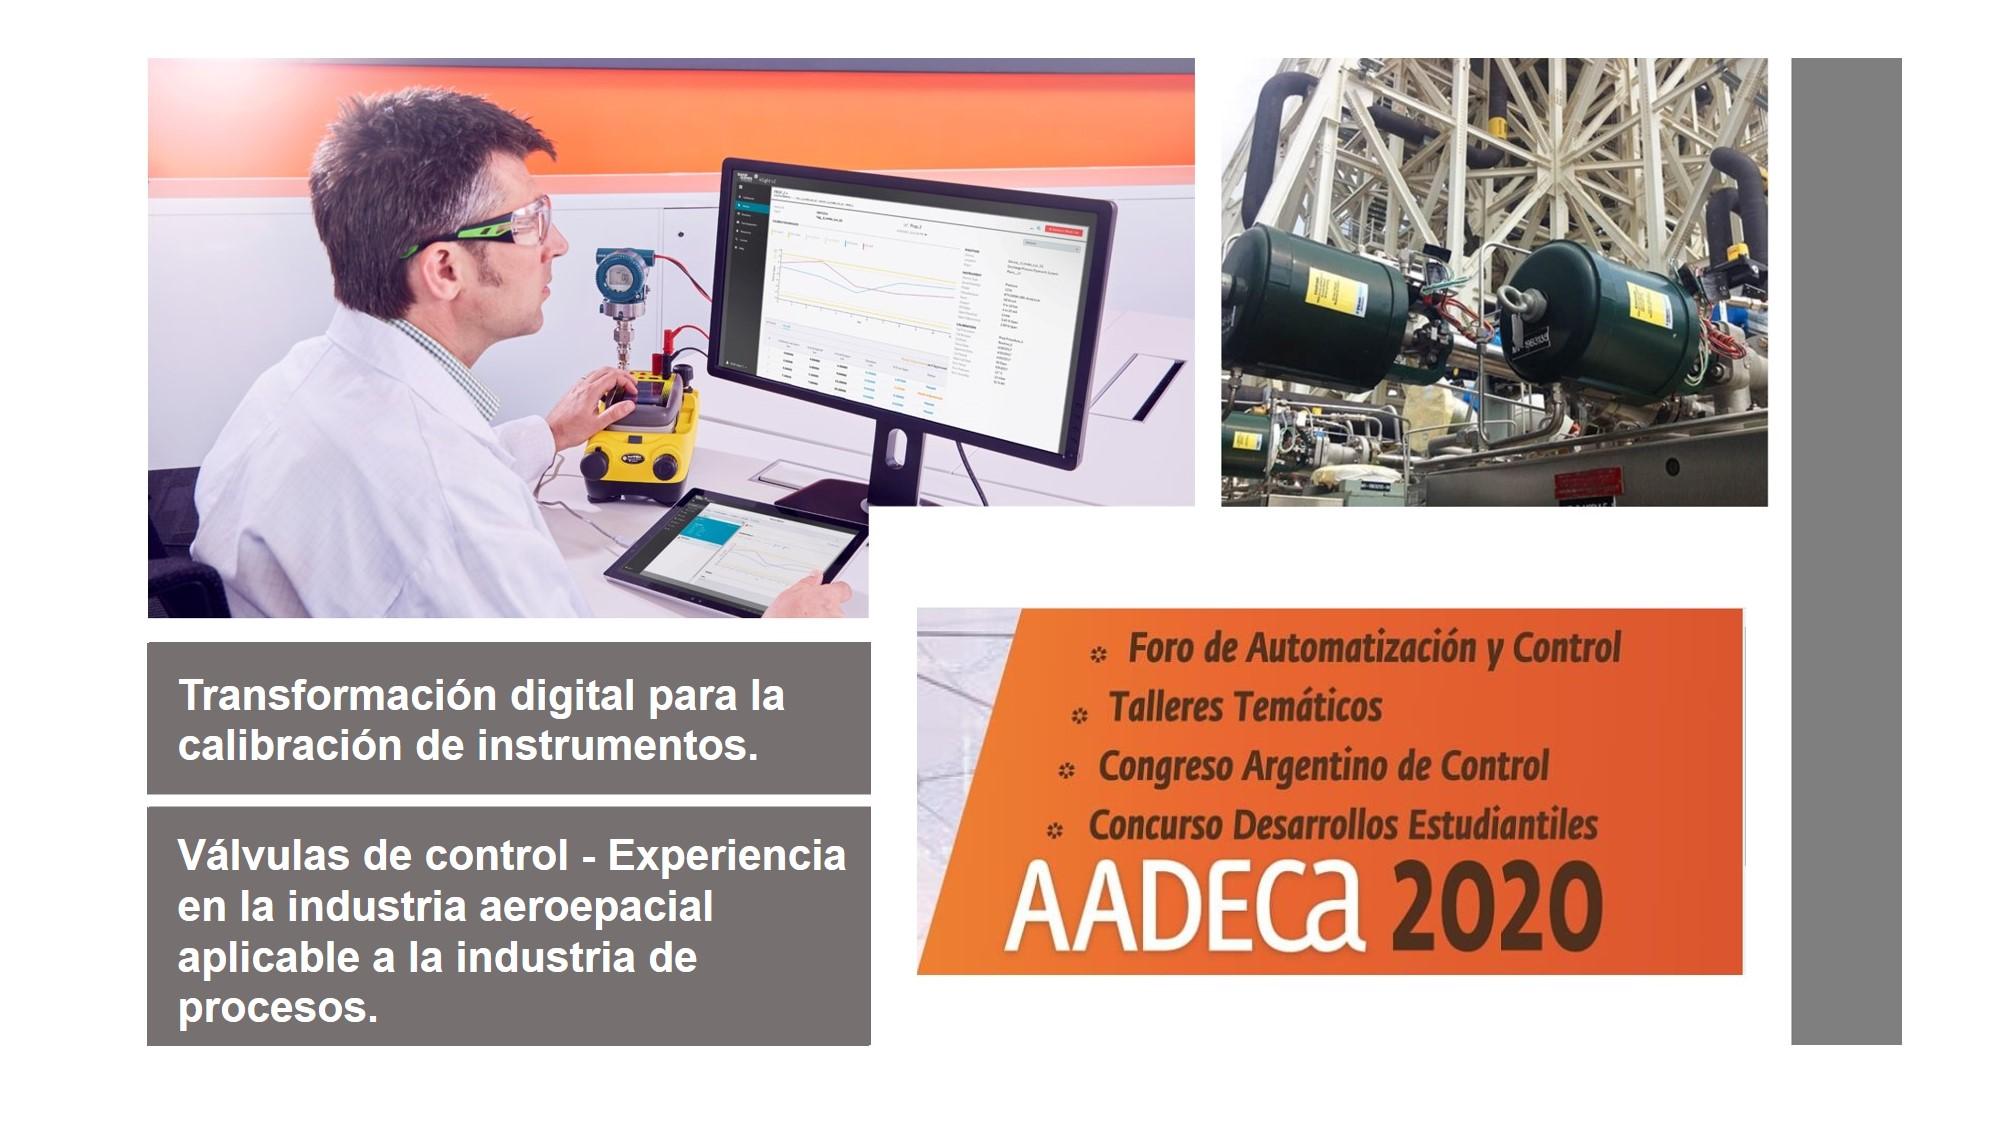 (Esp) PRESENTES en AADECA 2020